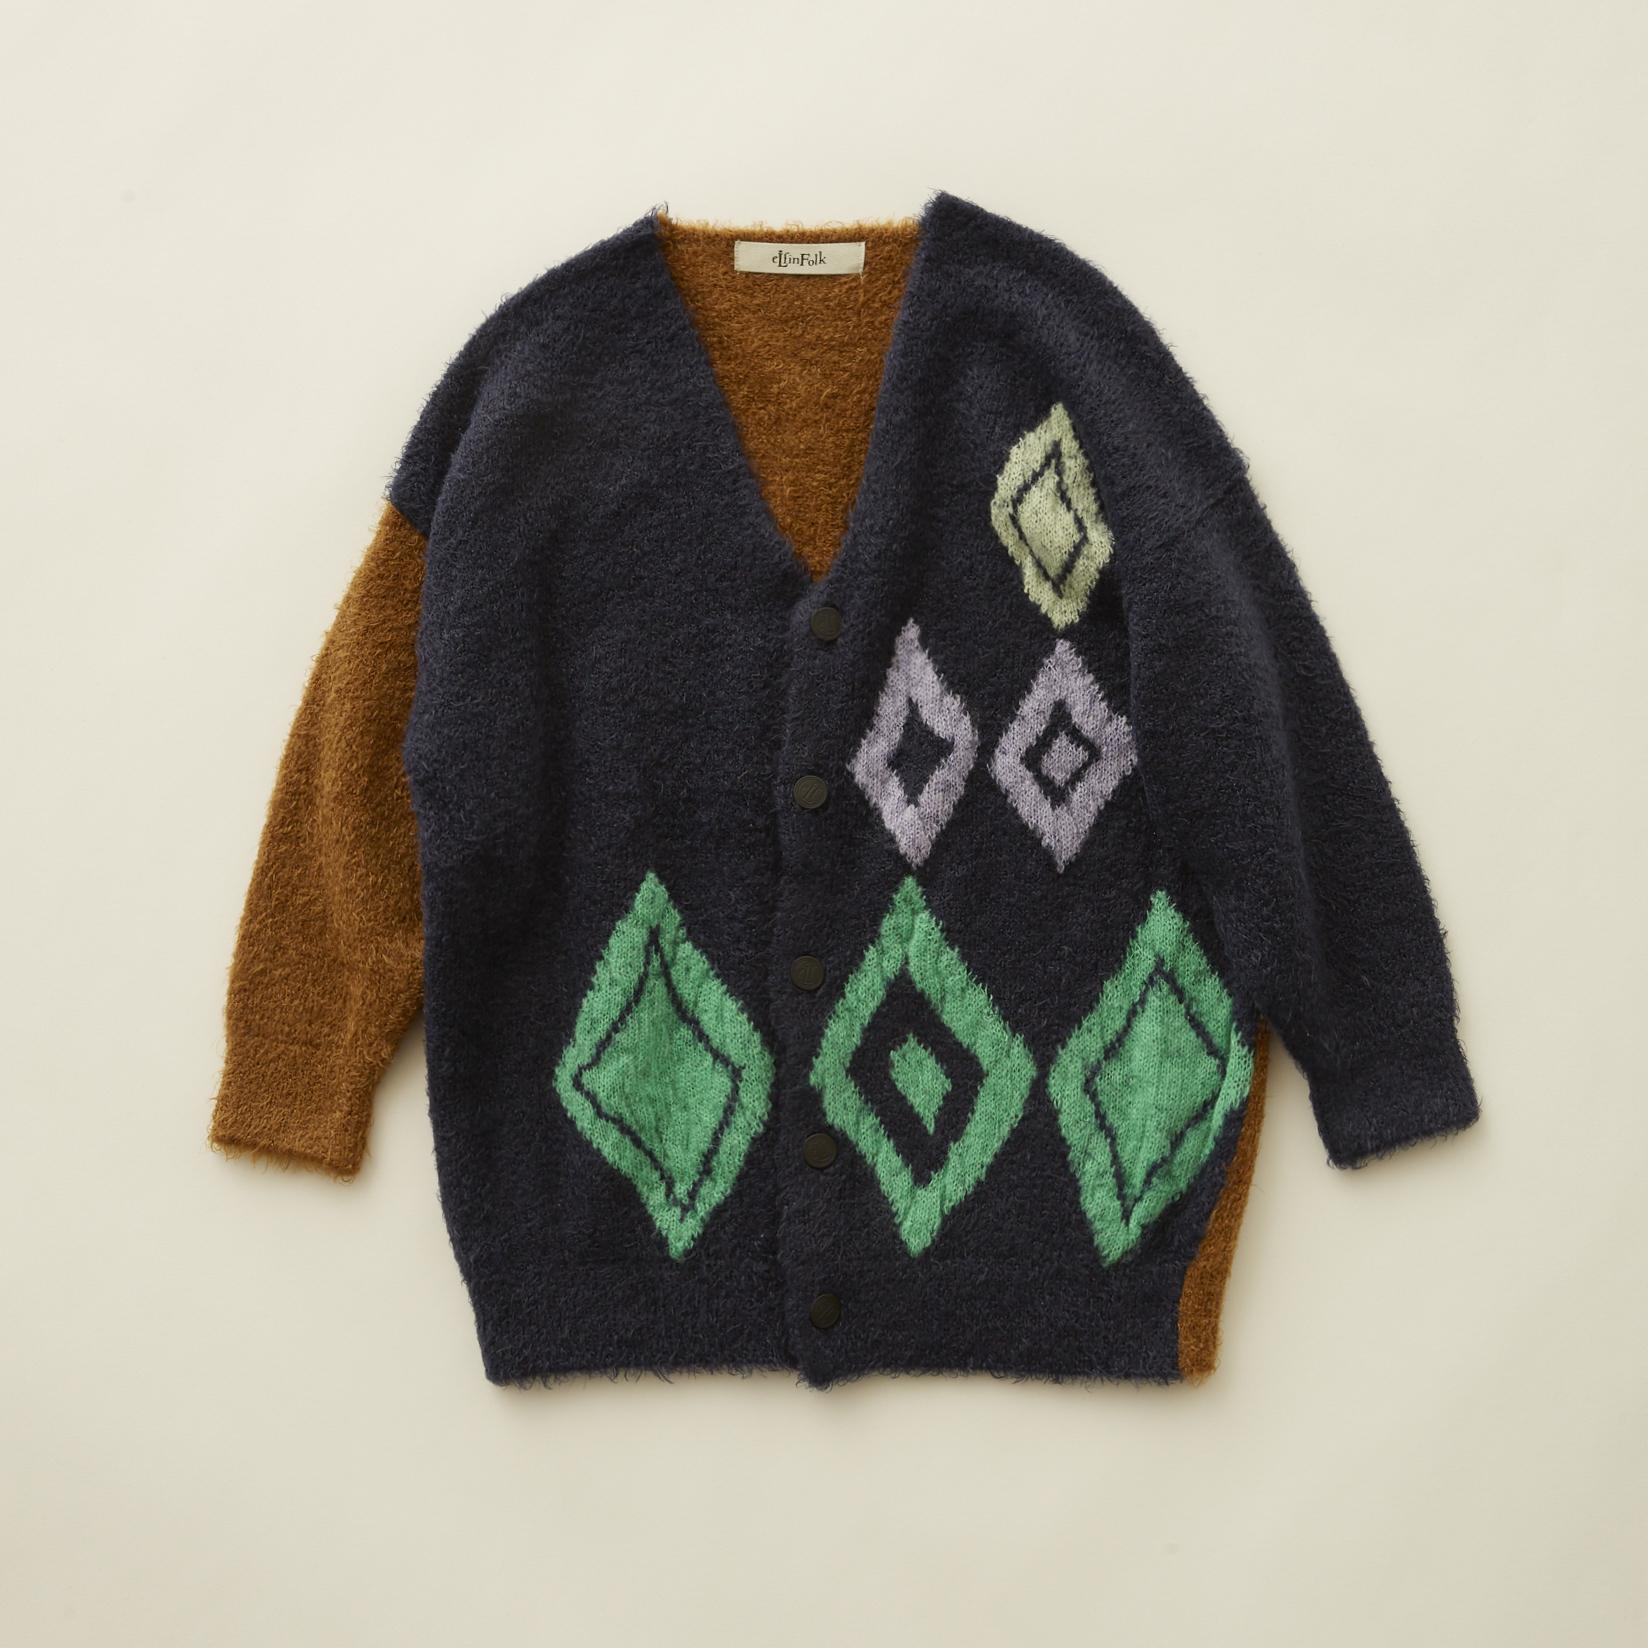 《eLfinFolk 2020AW》jura knit  cardigan / navy / 110・130cm